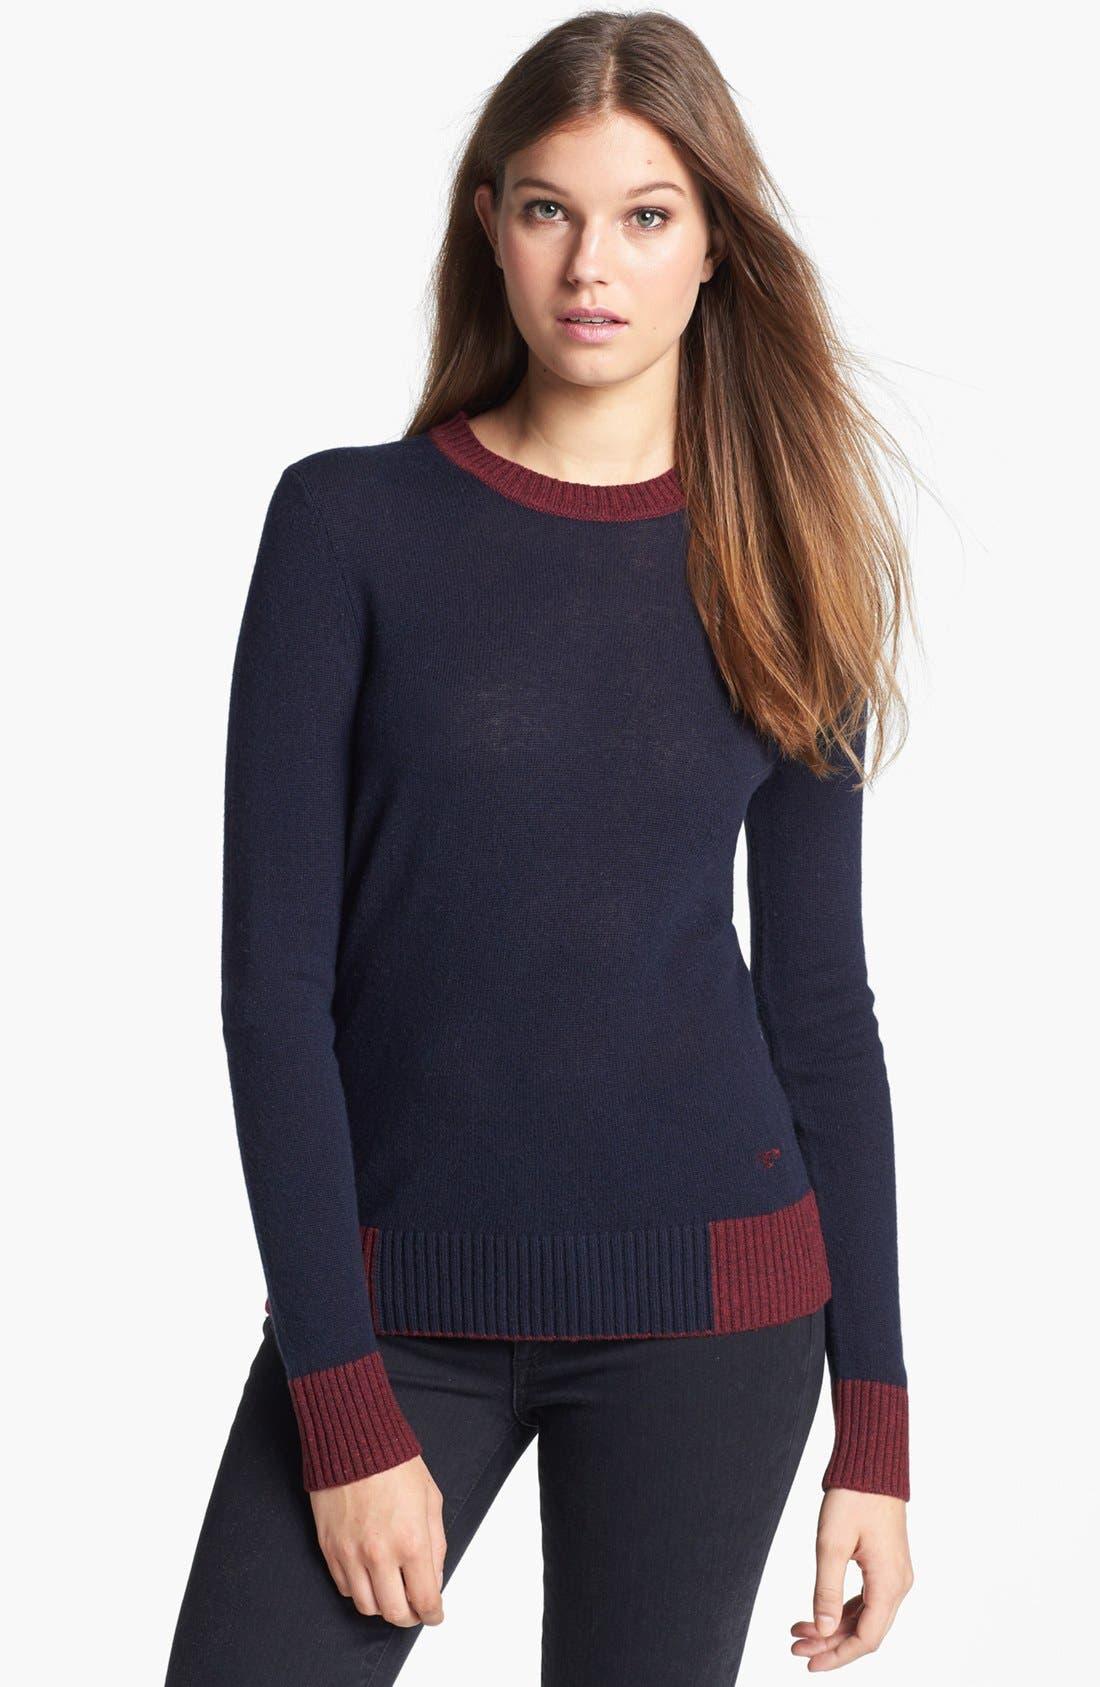 Main Image - Tory Burch 'Mandy' Wool & Cashmere Sweater